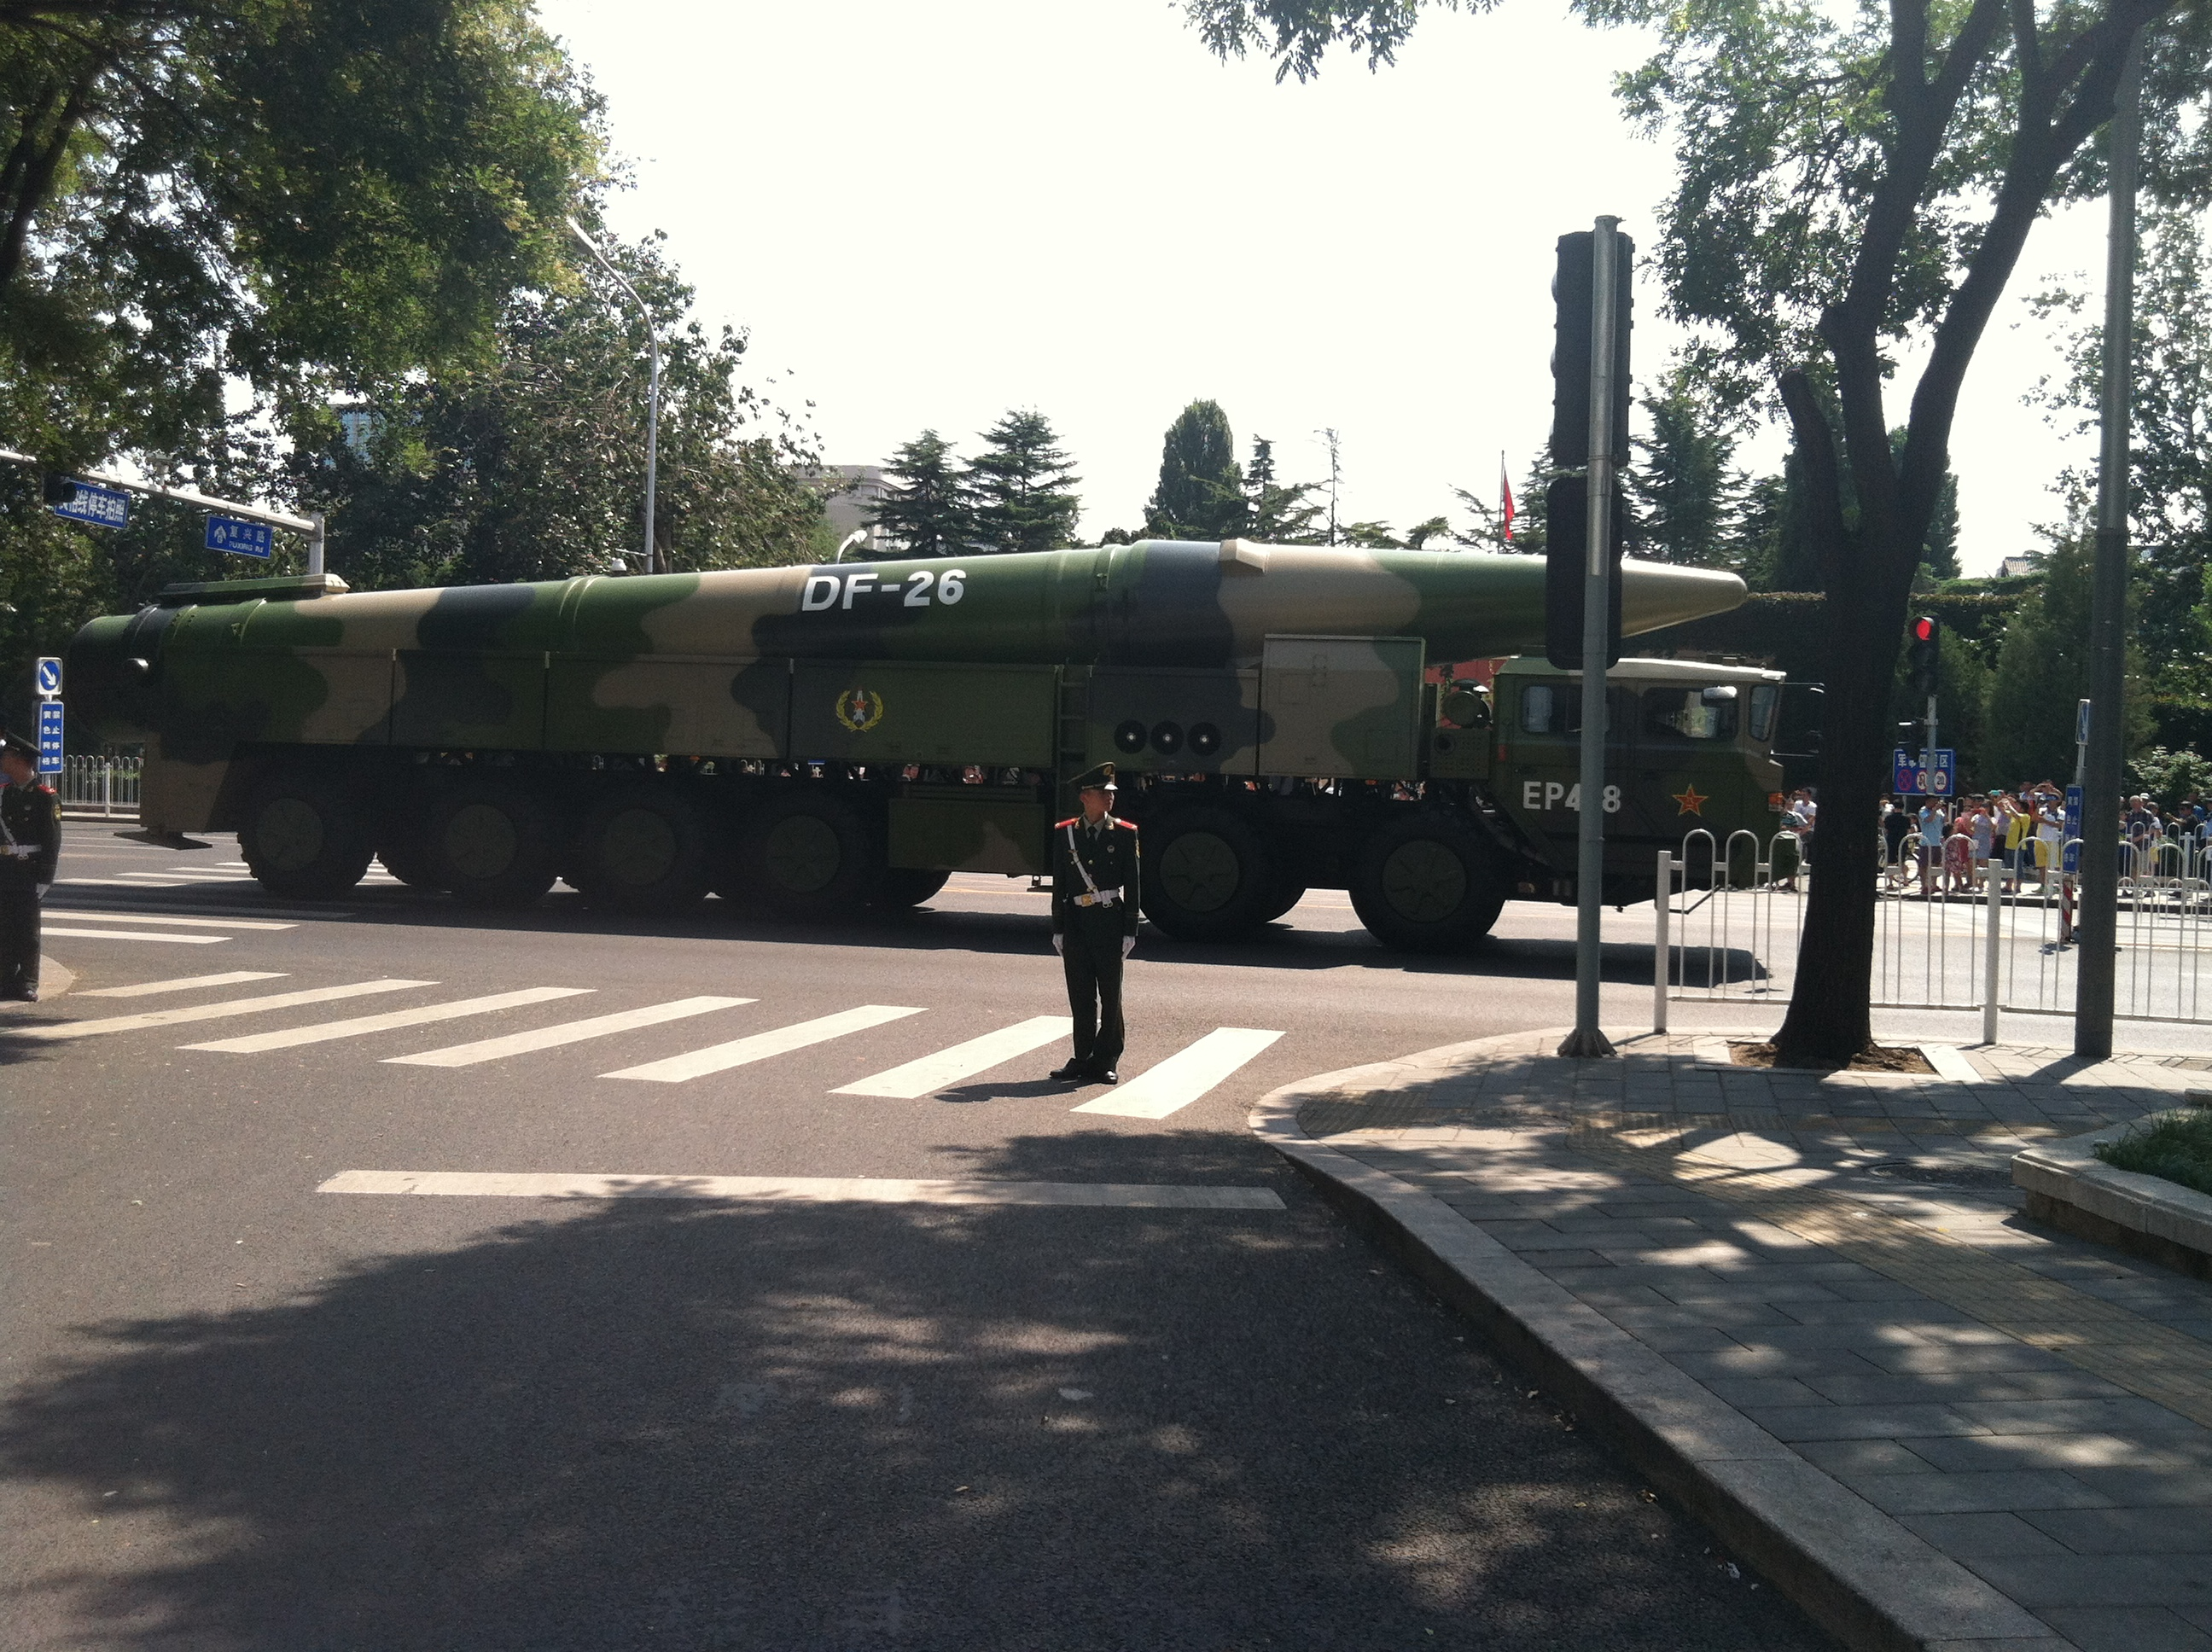 The DF-26 ballistic missile